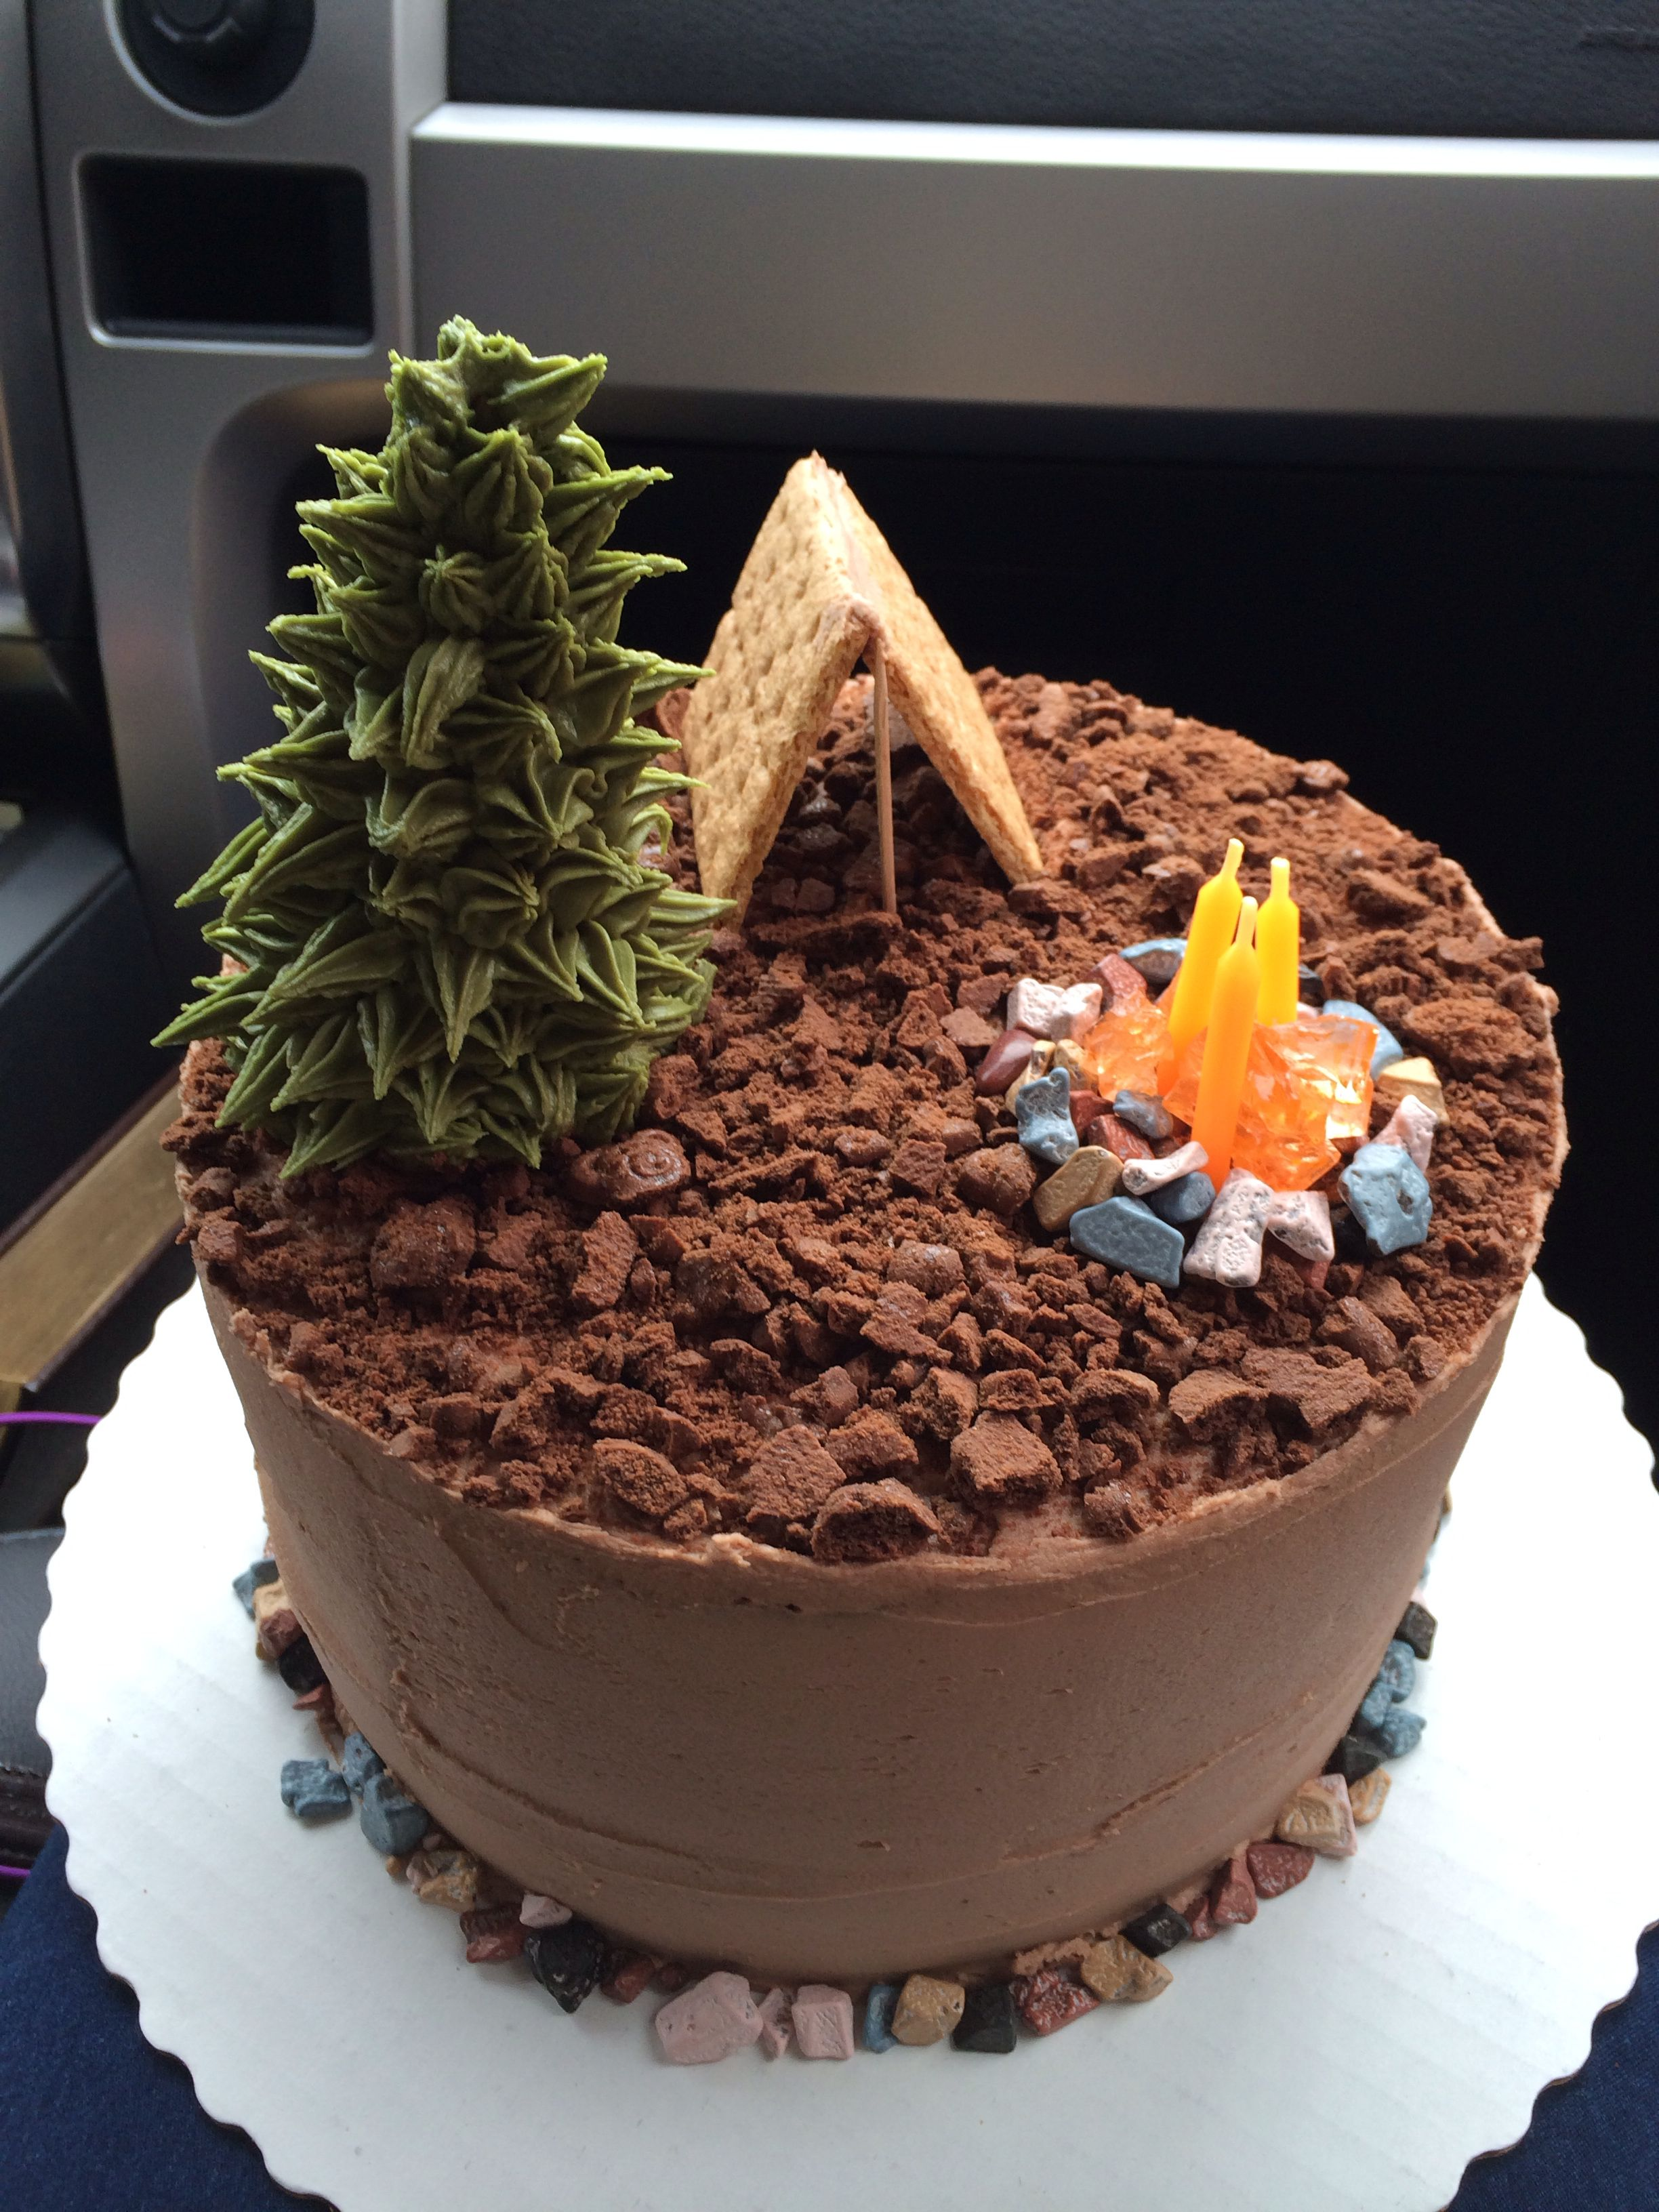 Wondrous Camping Cake Camping Cakes Camping Birthday Cake Cake Decorating Birthday Cards Printable Opercafe Filternl